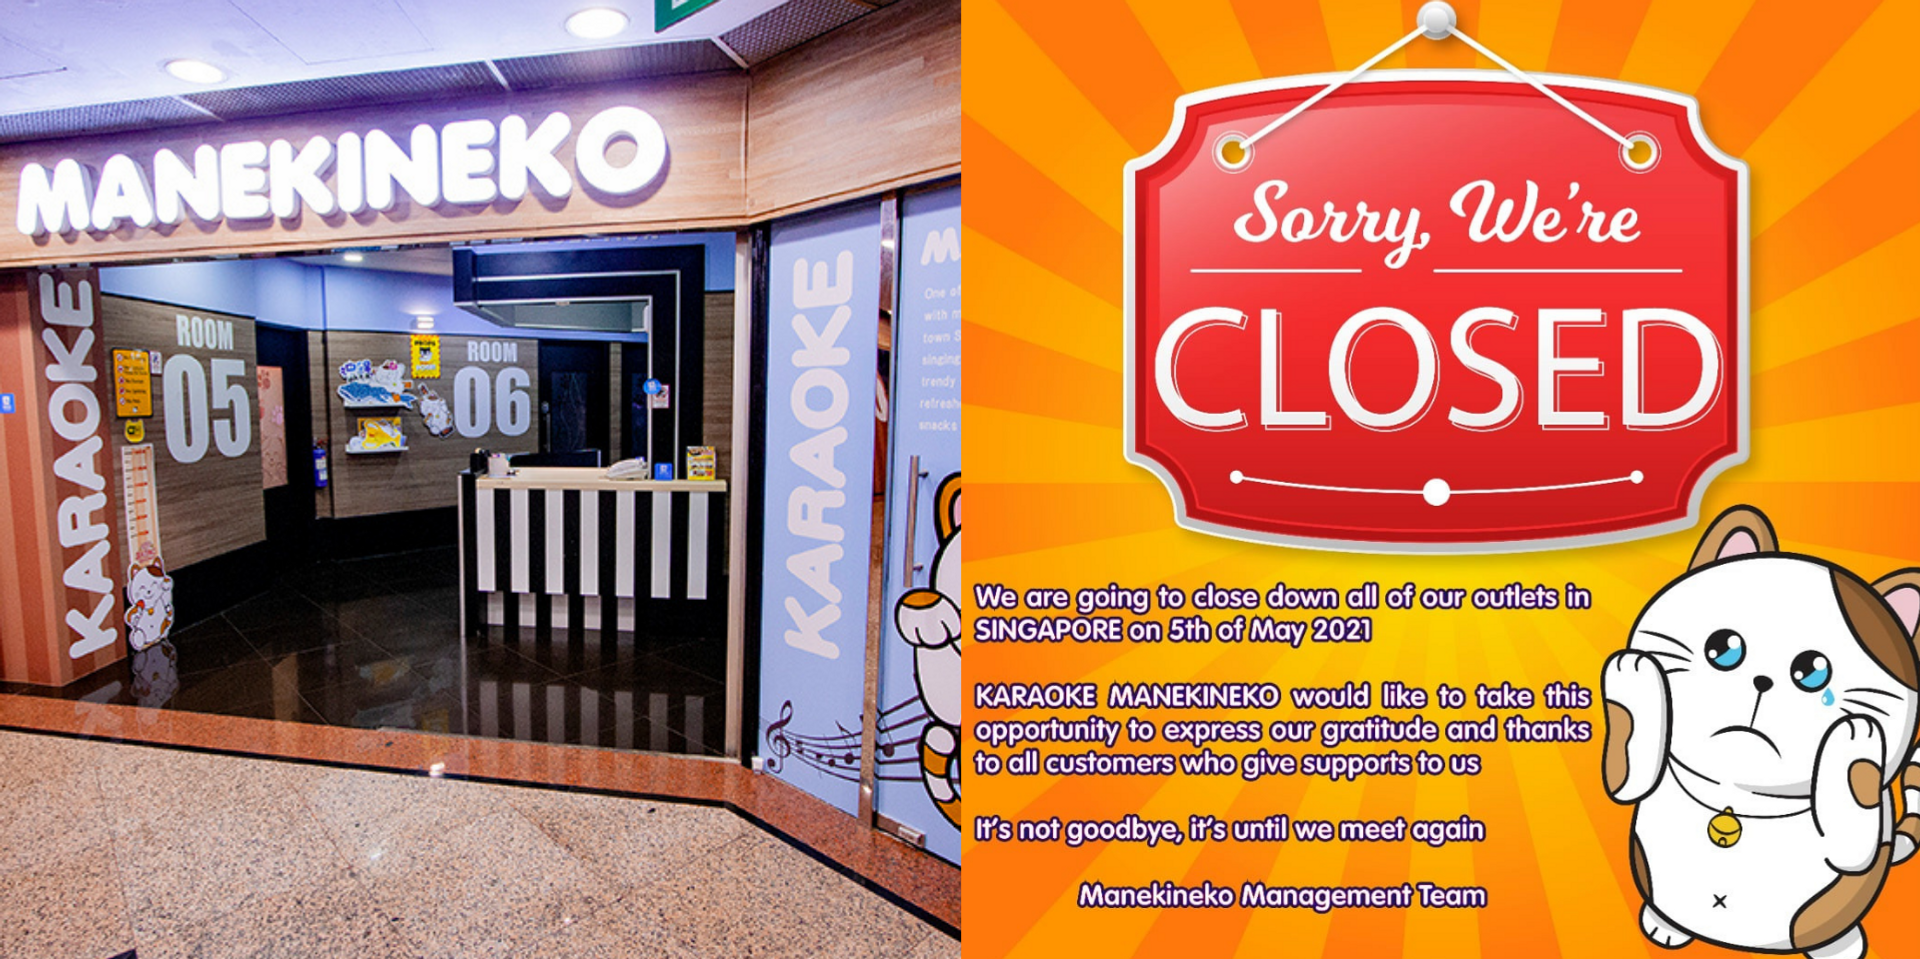 Karaoke Manekineko announces closure of Singapore outlets, sad customers recount fond memories of the KTV over the years